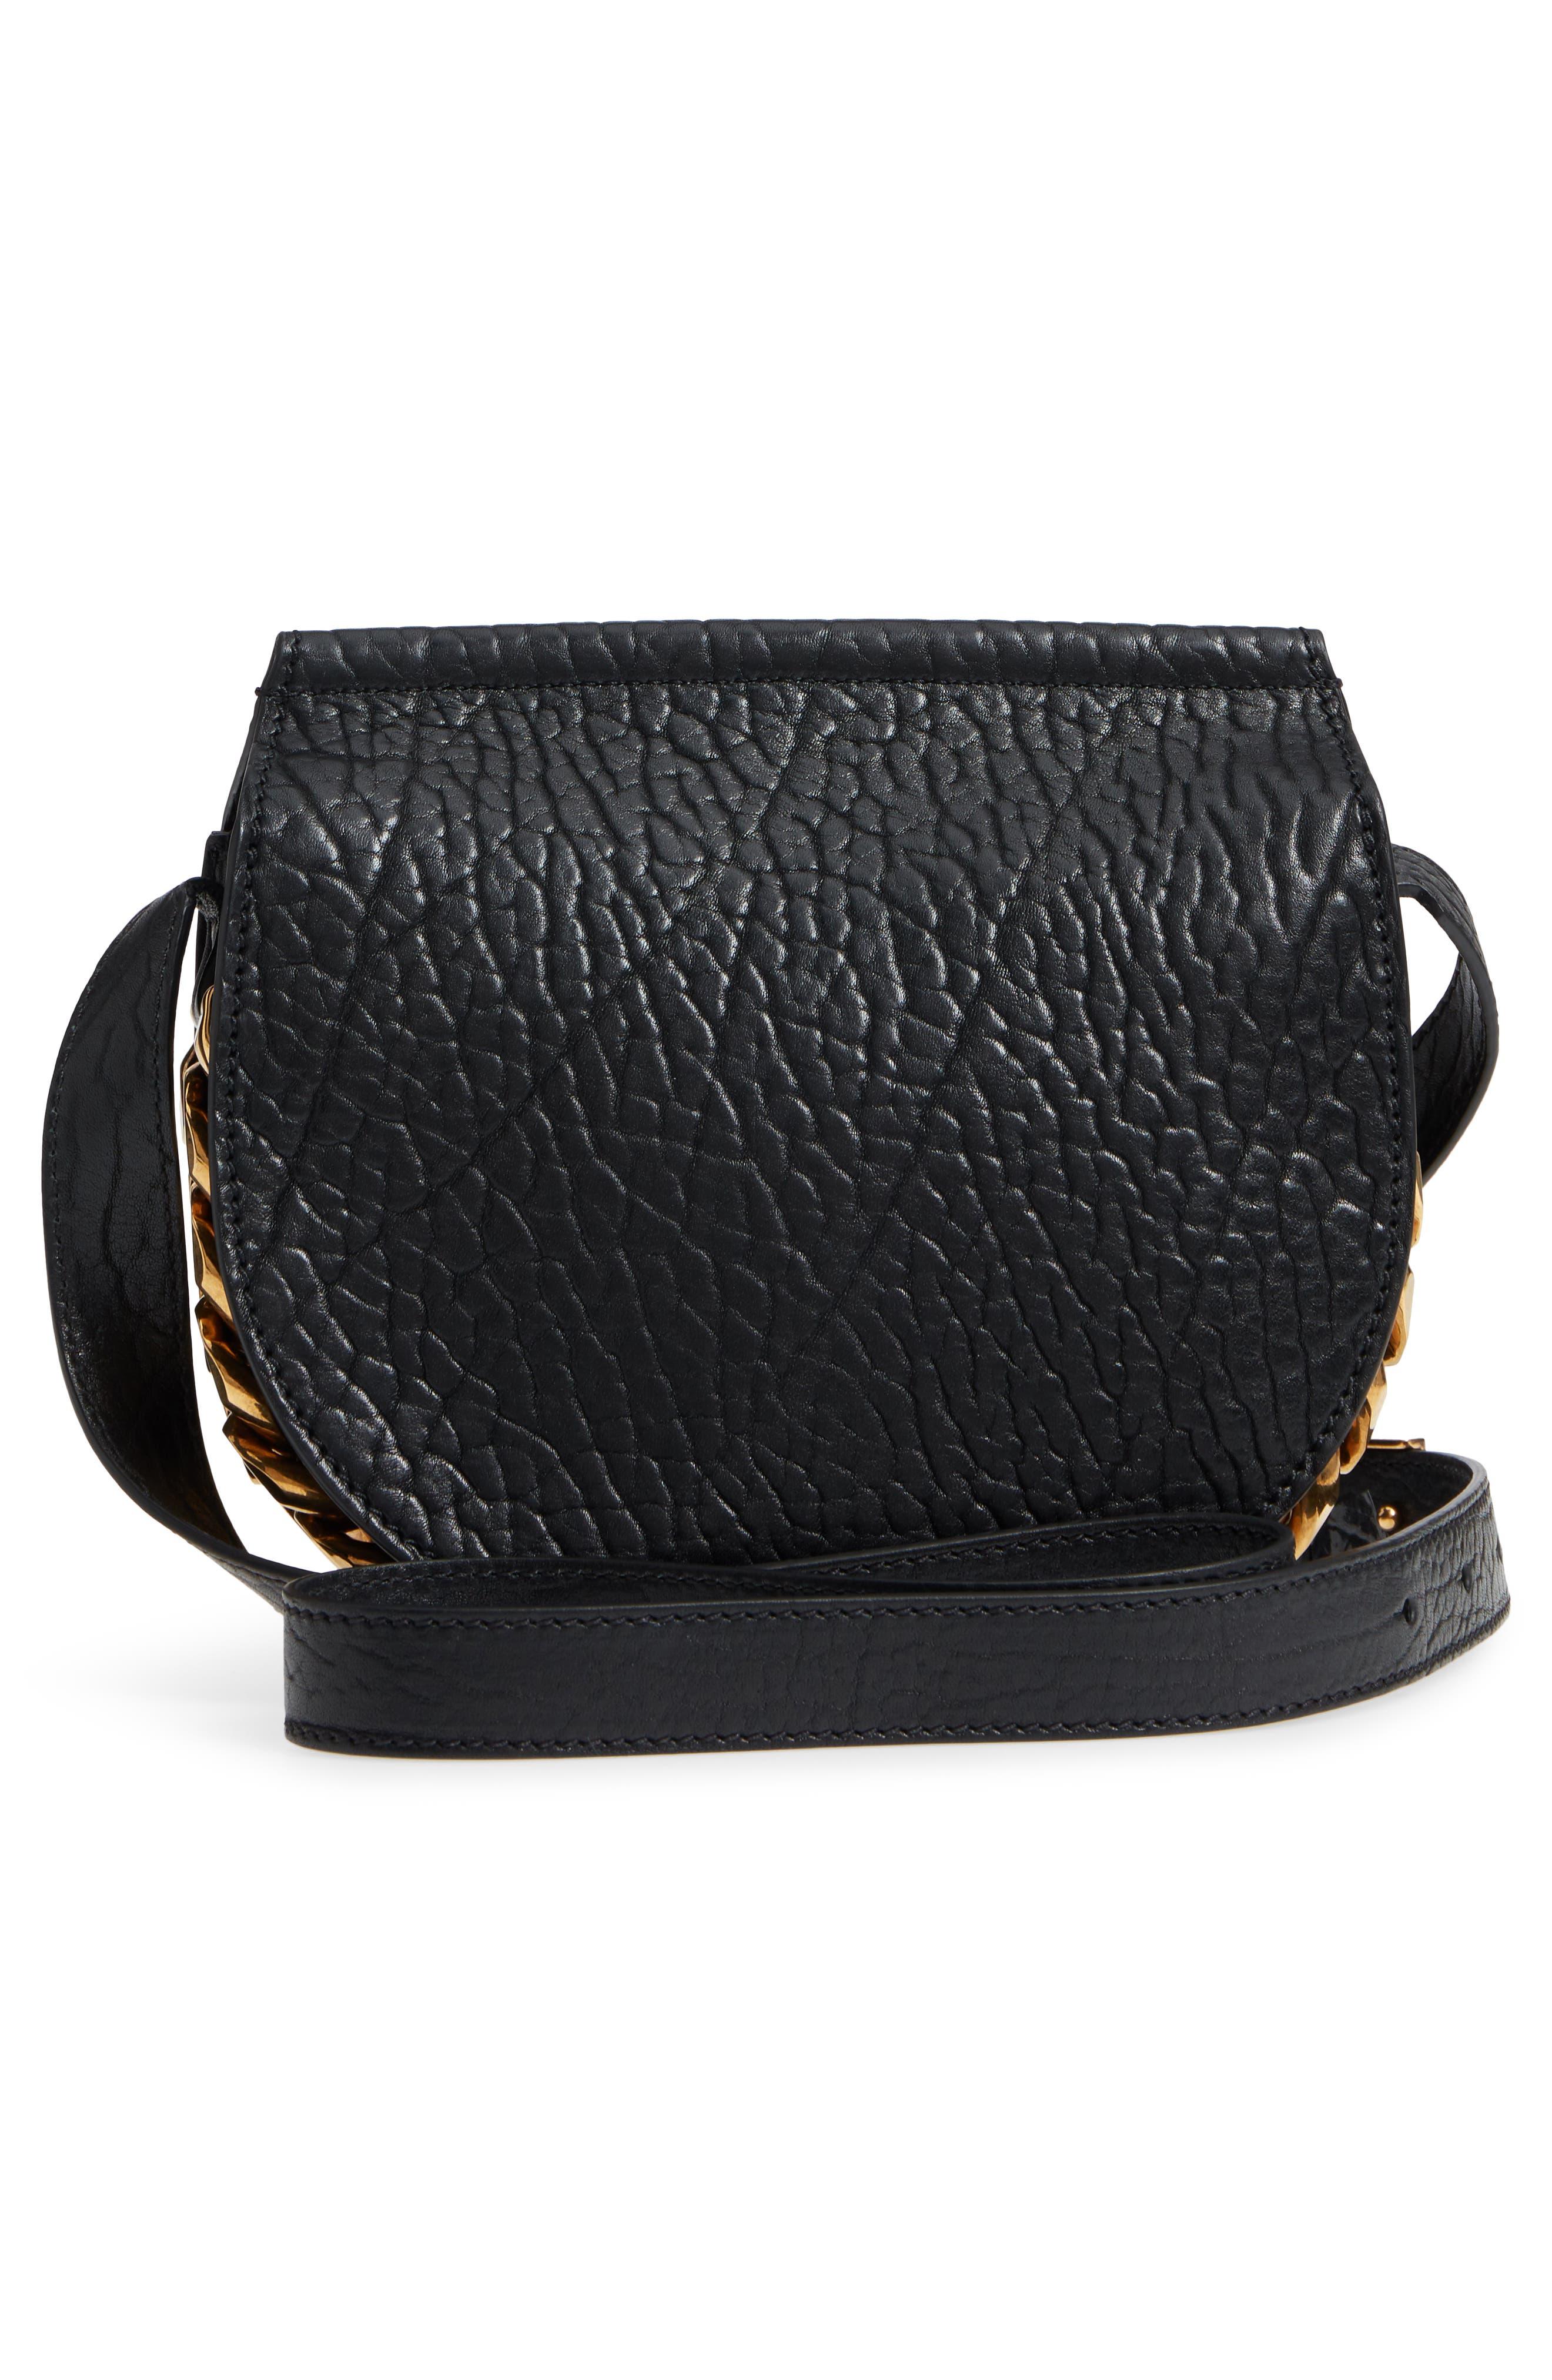 Infinity Calfskin Leather Saddle Bag,                             Alternate thumbnail 3, color,                             001